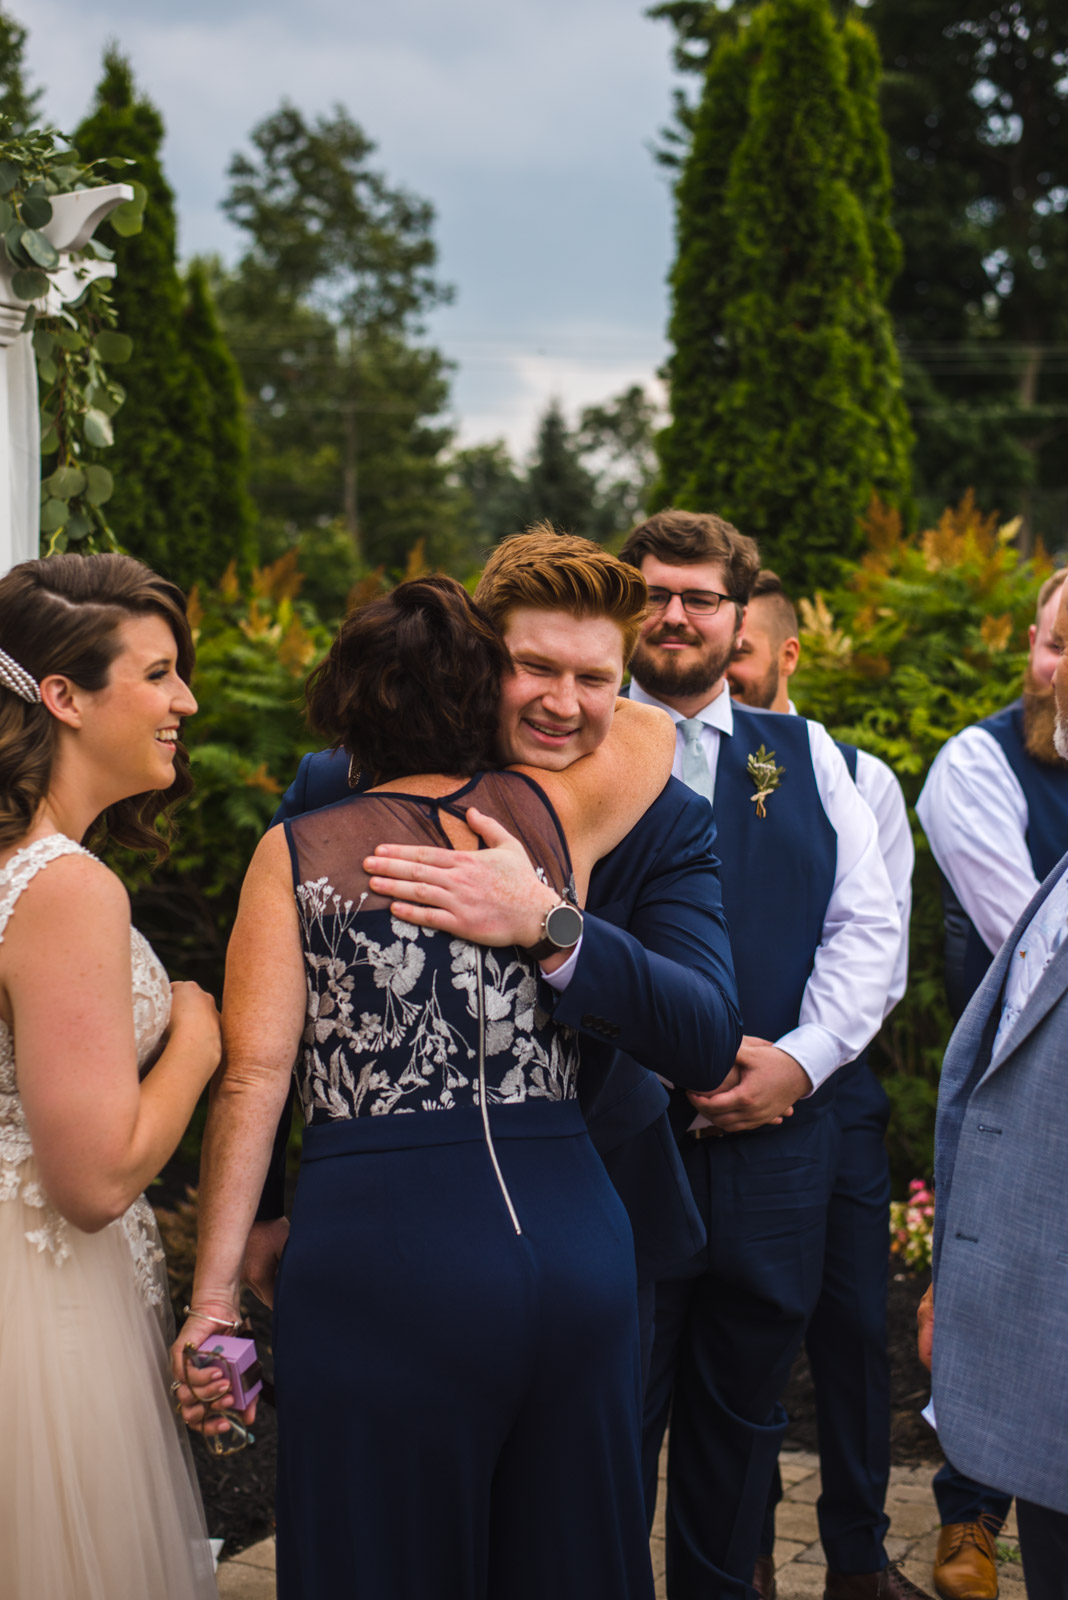 Emerson & Elicia's Golf Course Wedding Aidan & Leanne Hennebry Hamilton Wedding Videographers Photographers Niagara Hush Hush Photography & Film-18.jpg